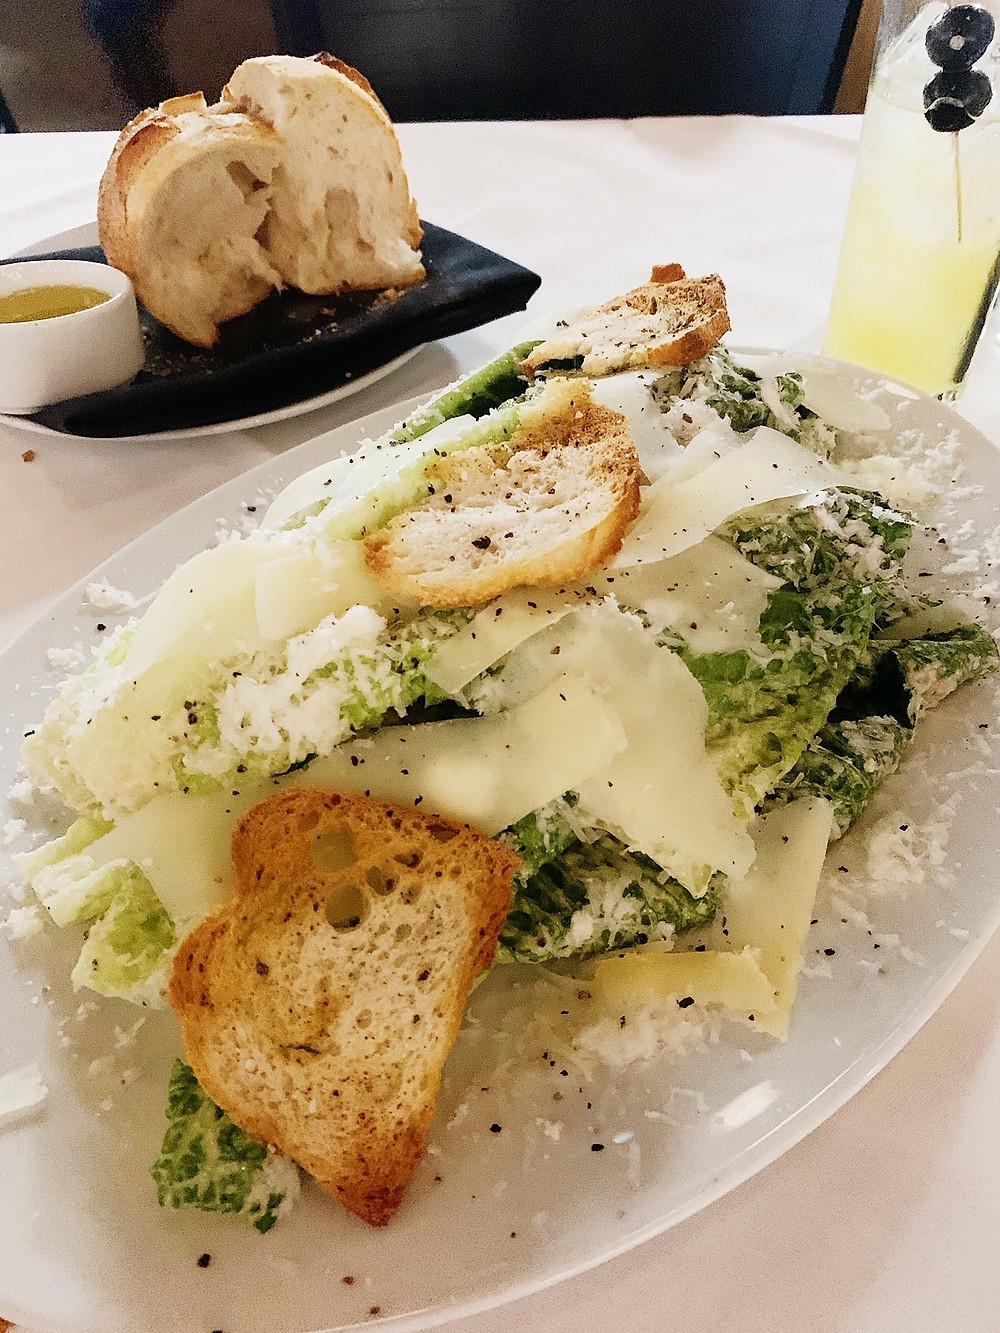 The GJ Caesar Salad